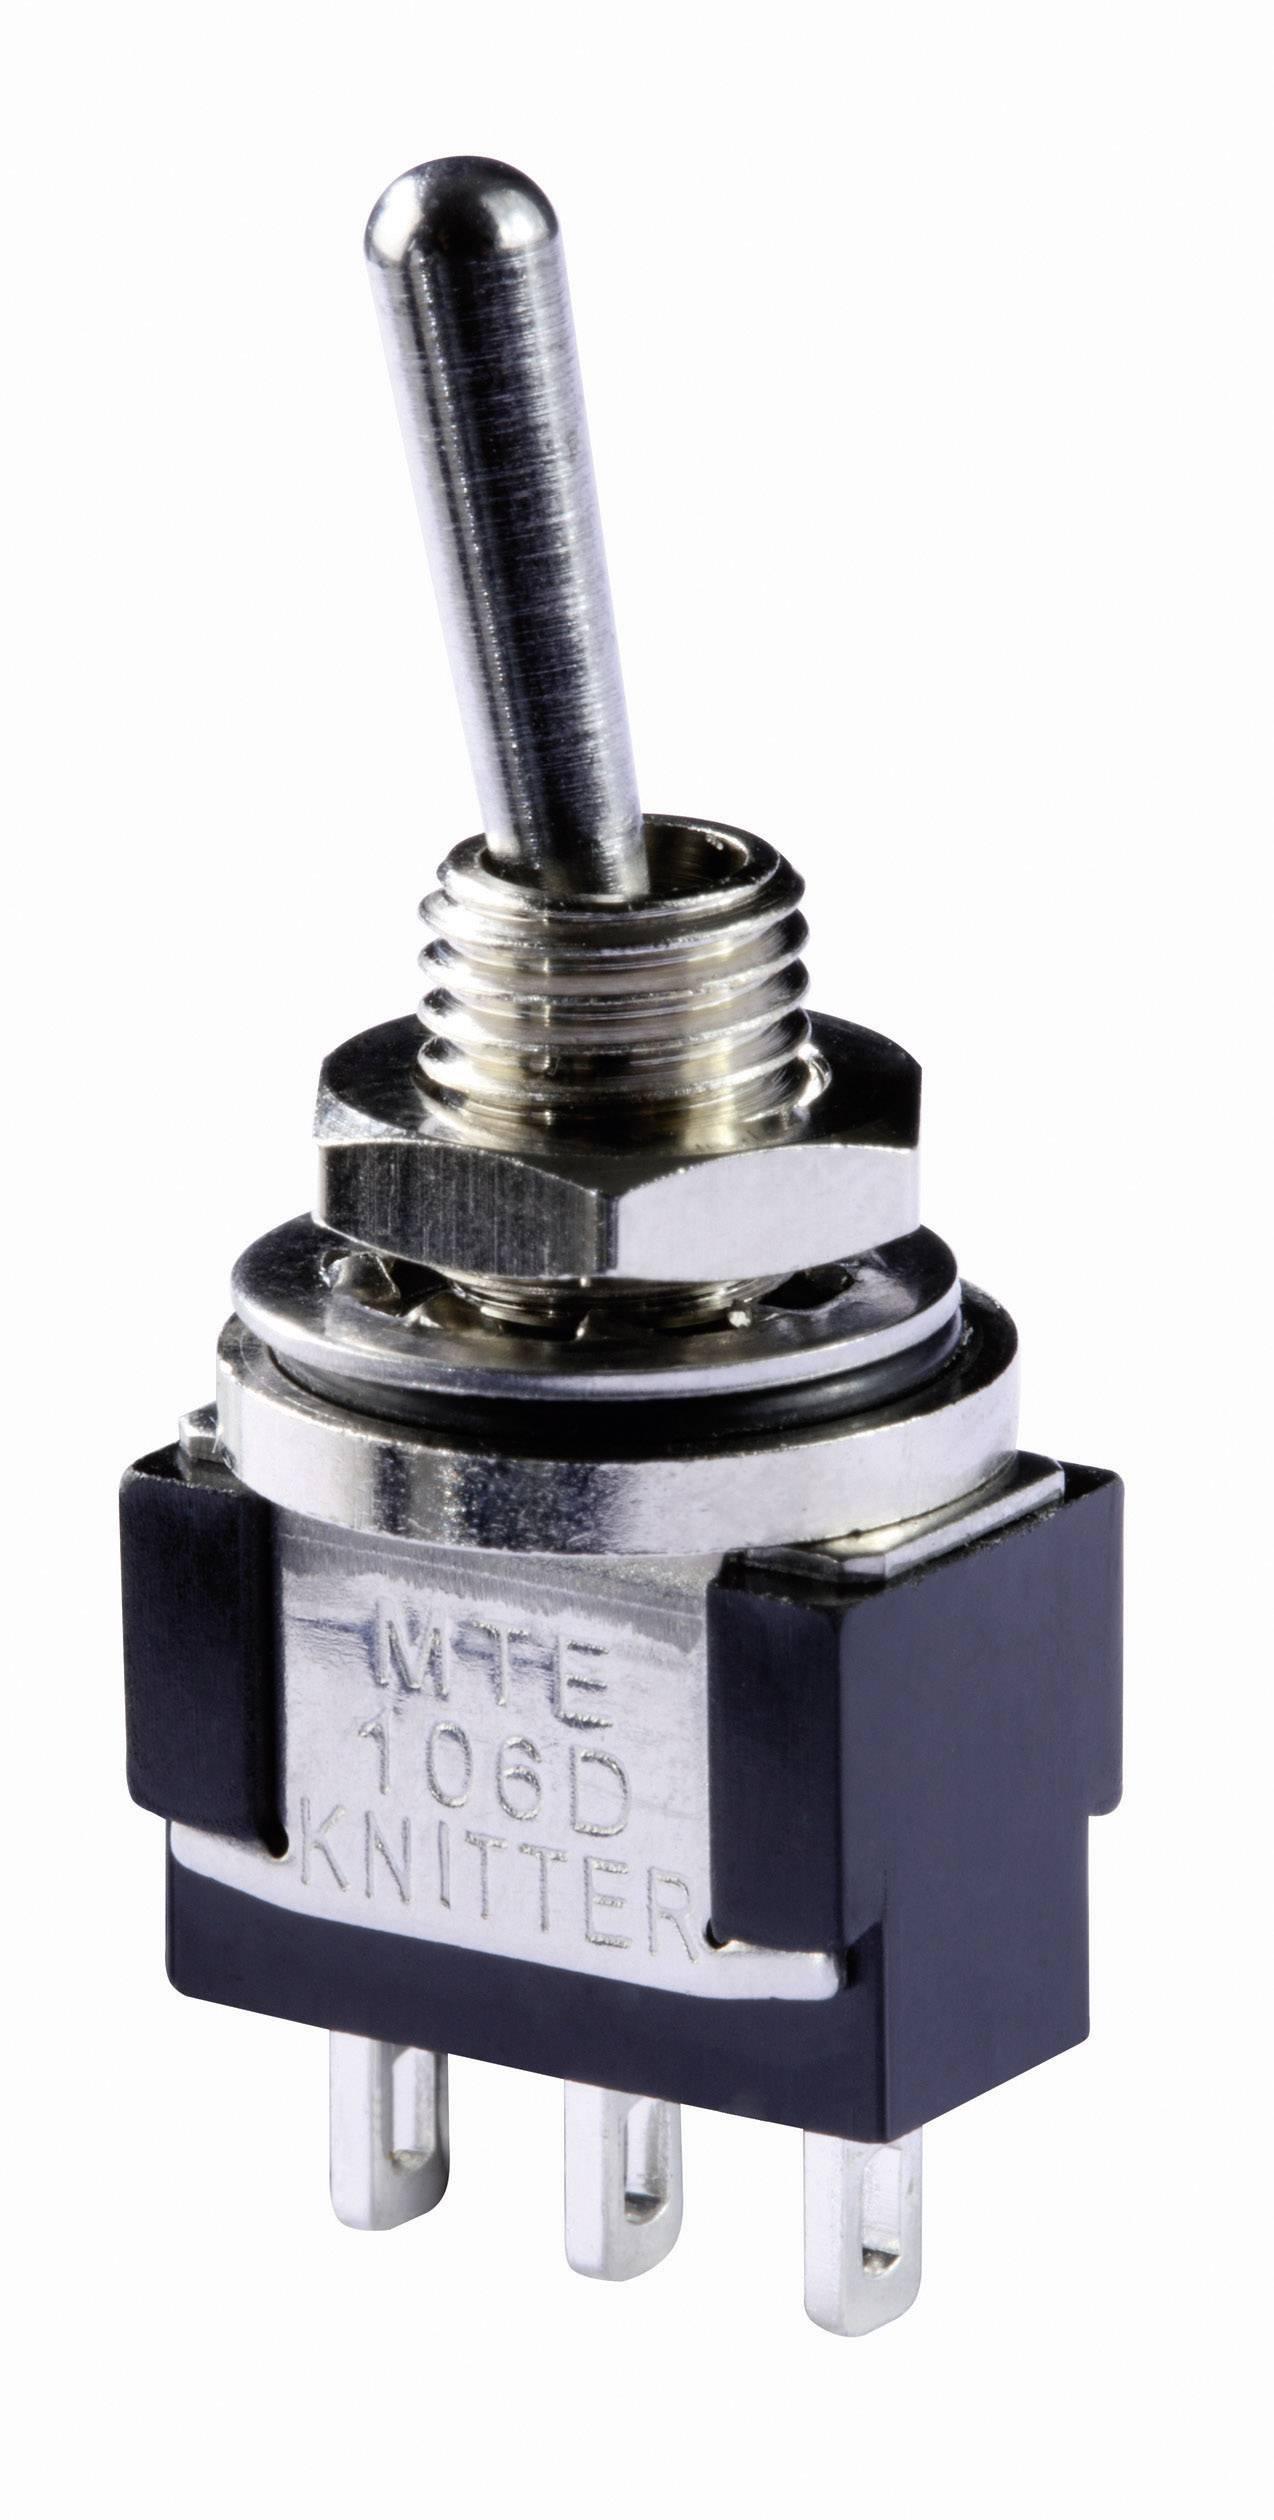 Pákový spínač Knitter-Switch MTE 106E, 250 V/AC, 3 A, IP67, 1 ks